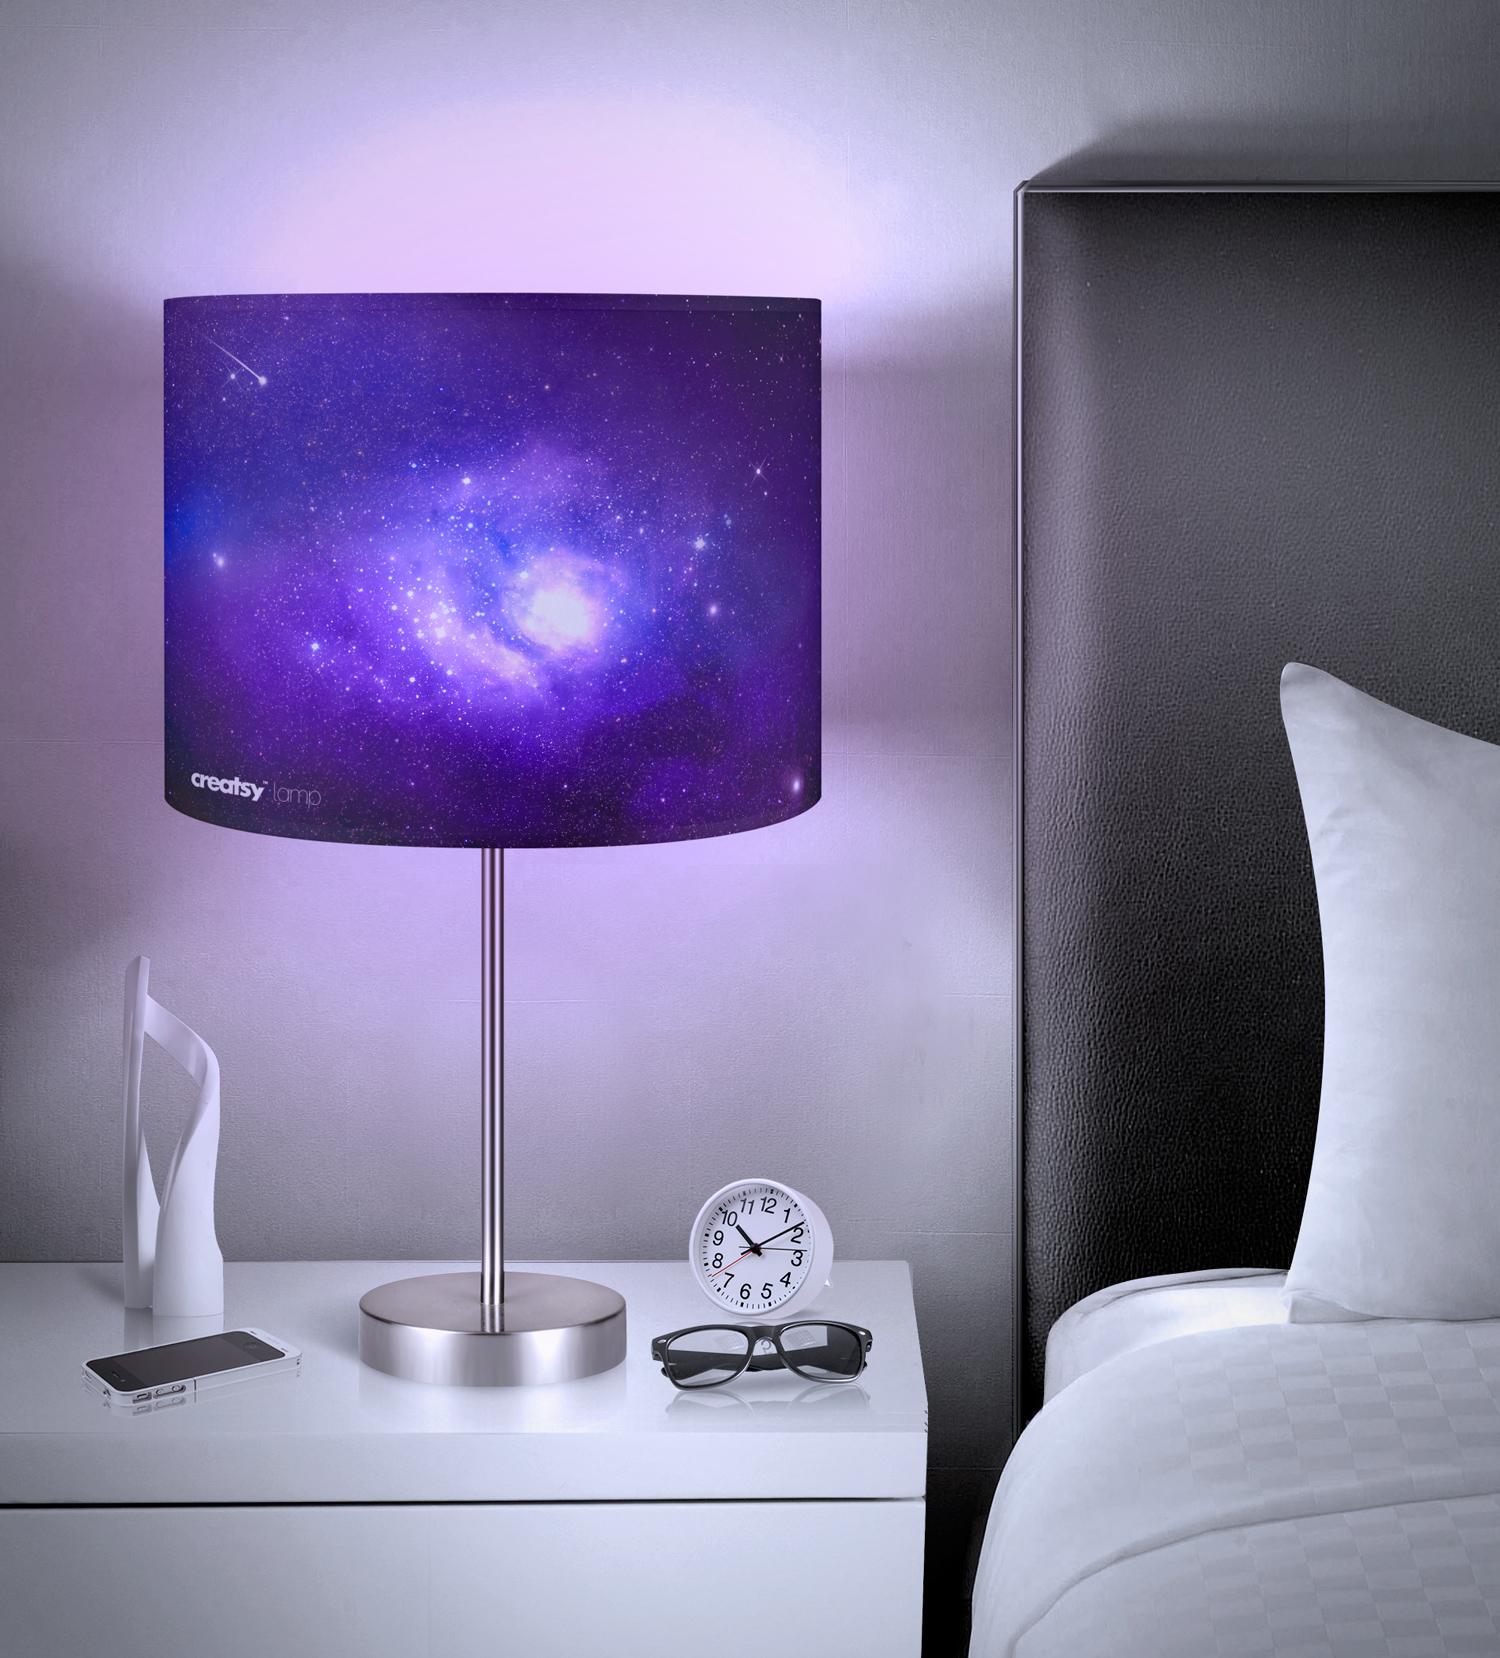 موکاپ چراغ خواب کنار تخت